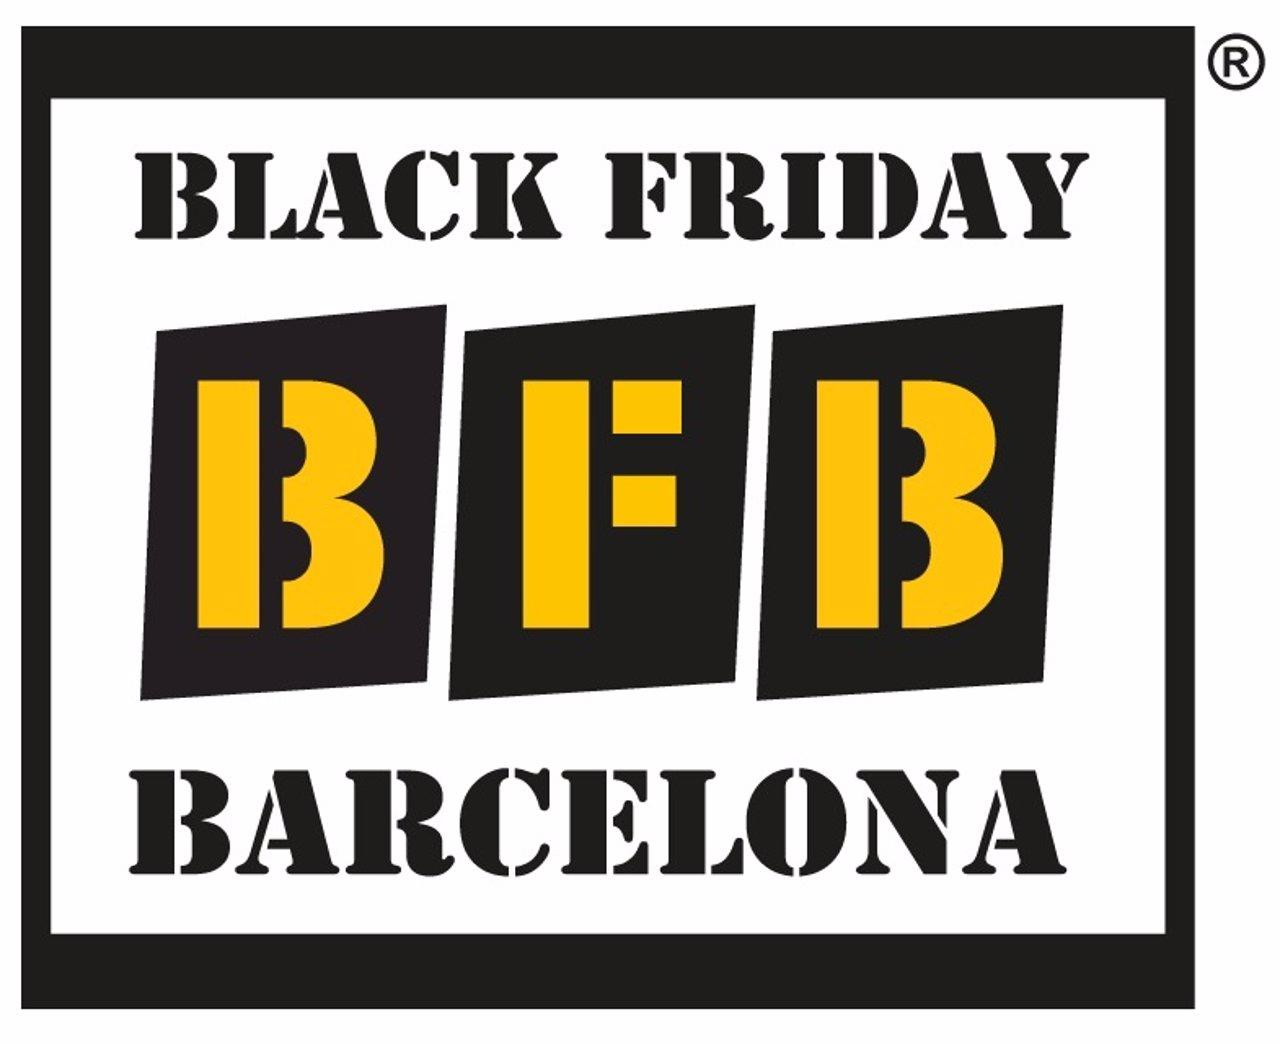 Black Friday Barcelona